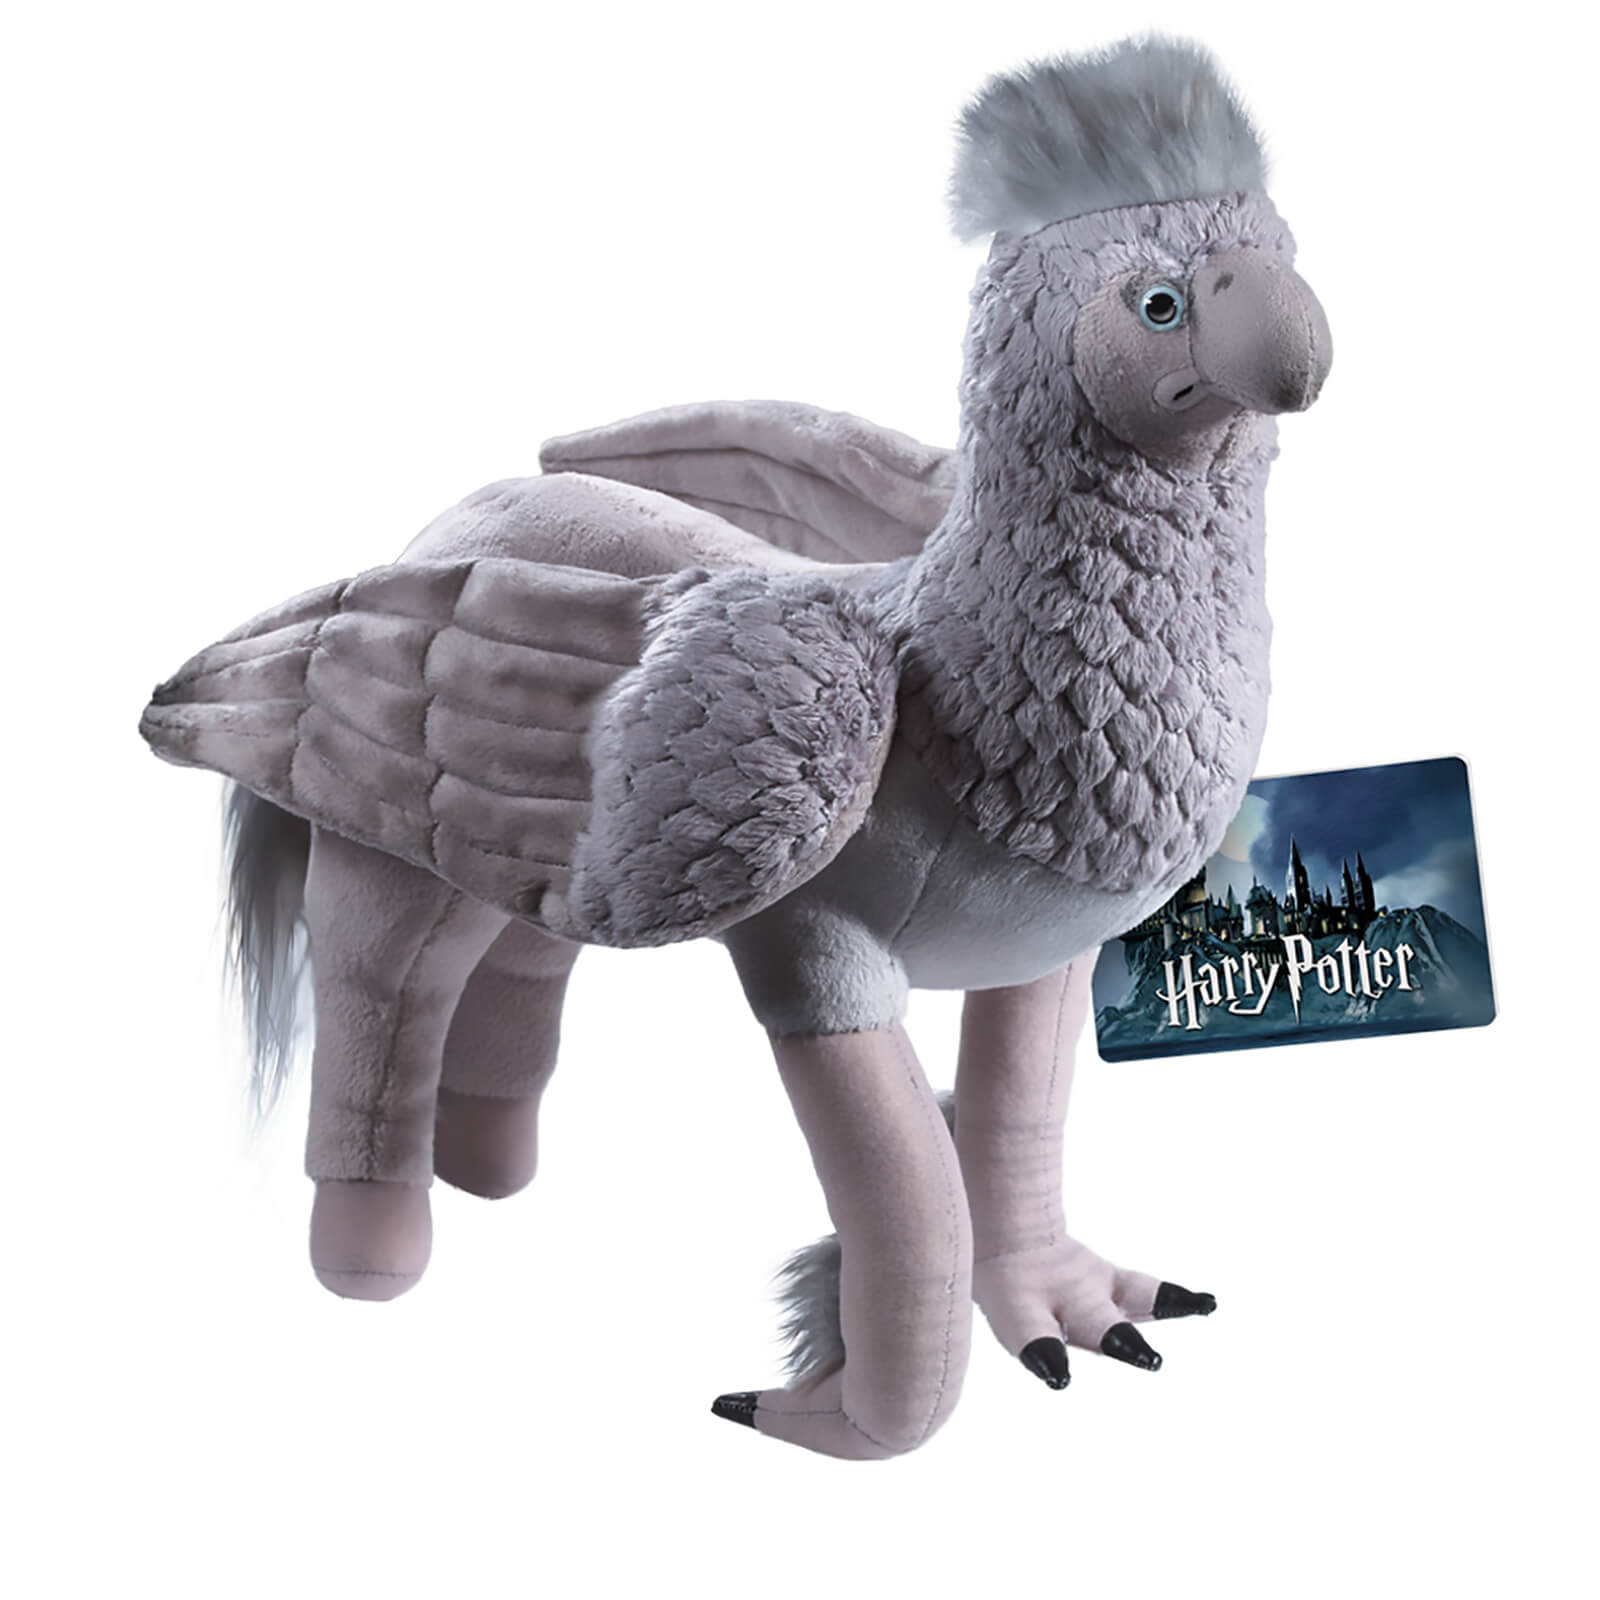 Image of Harry Potter Buckbeak Collector's Plush